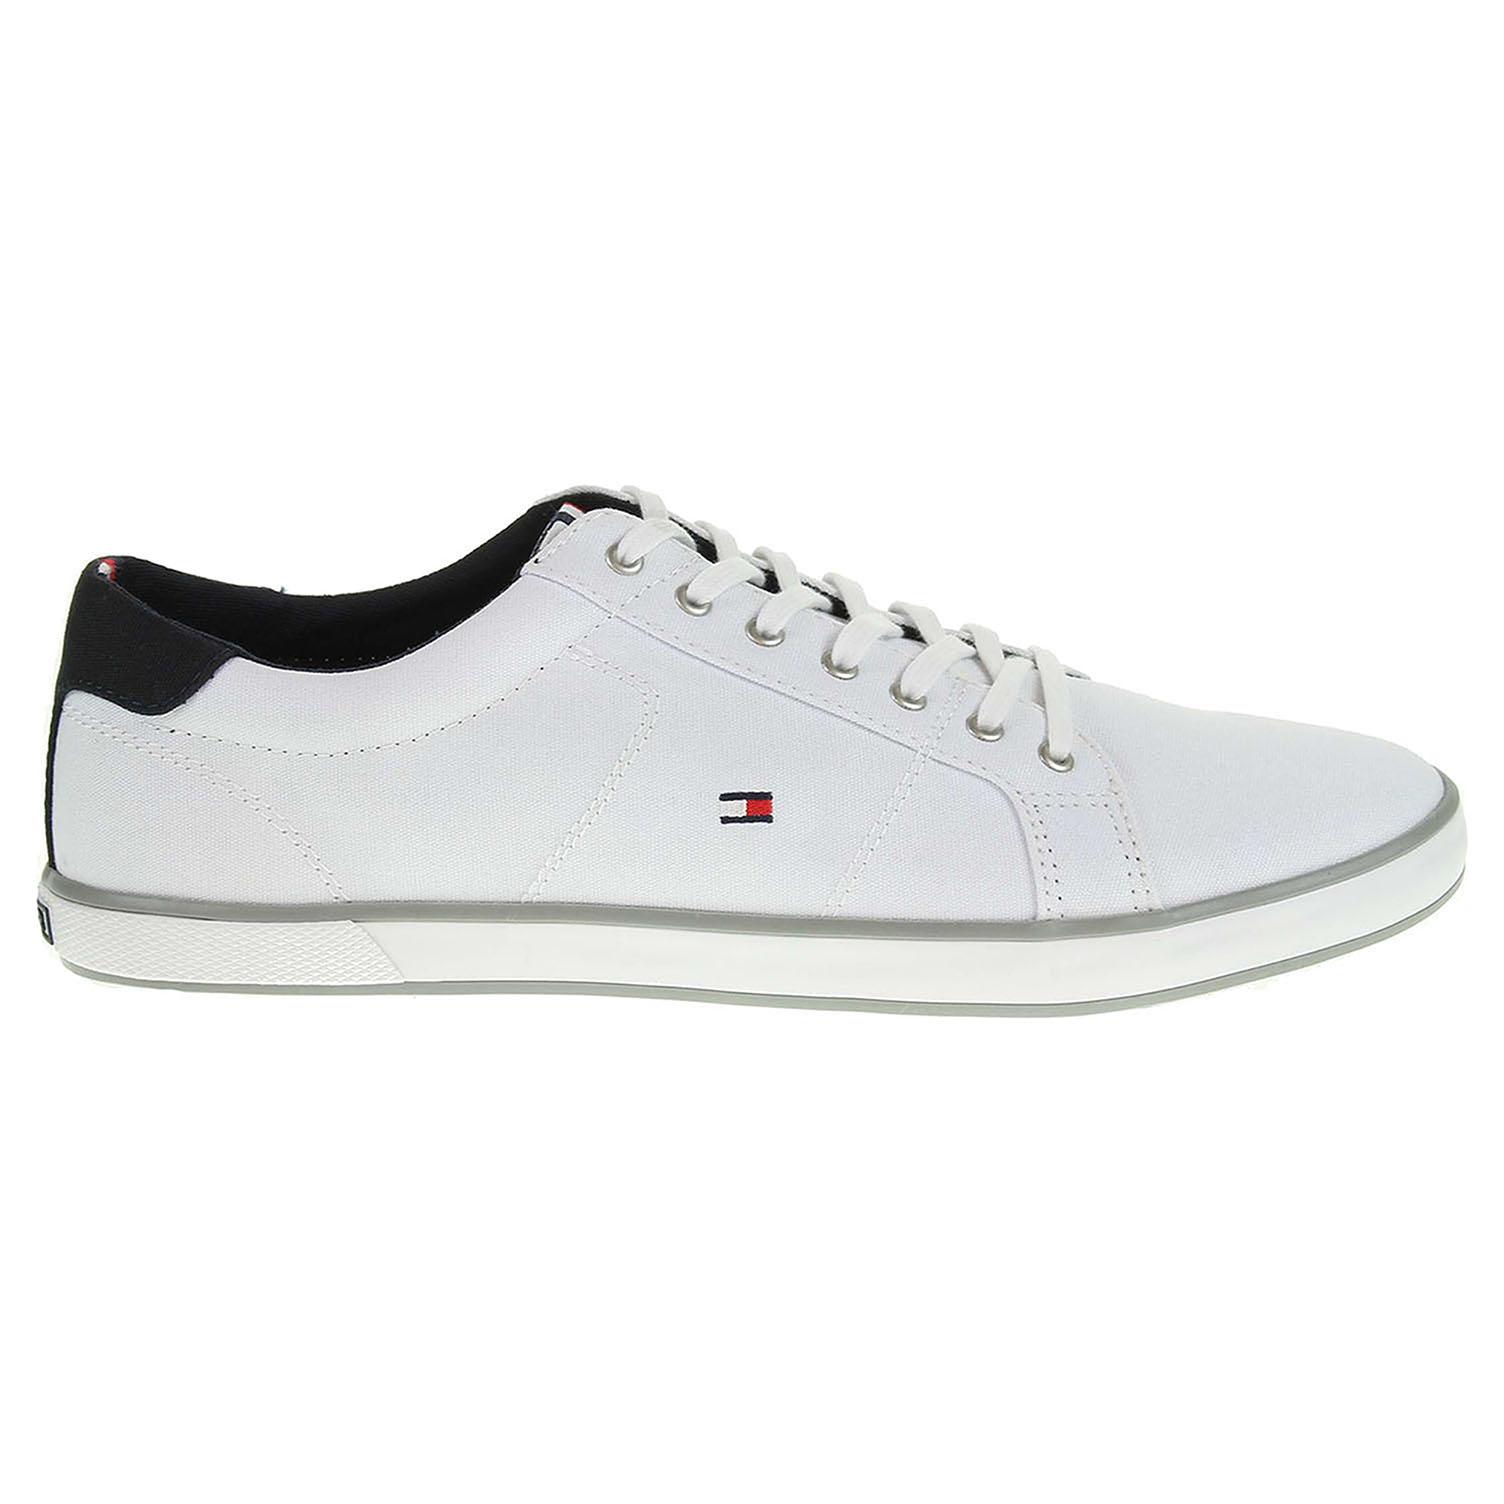 Ecco Tommy Hilfiger pánská obuv FM0FM00596 H2285ARLOW 1D bílá 24000449